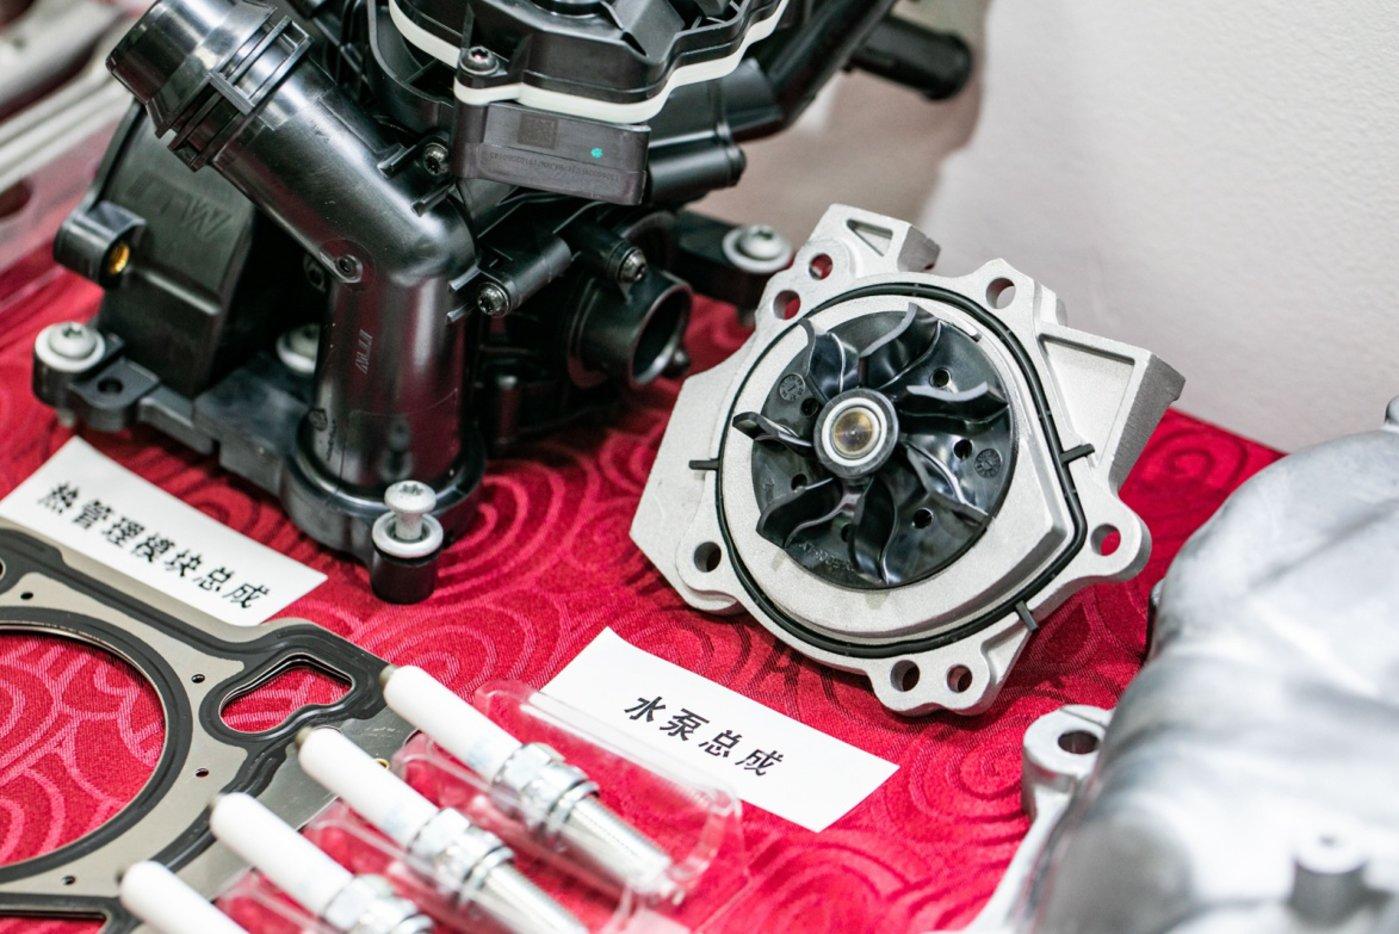 GW4C20B 2.0T汽油机零部件拆解展示